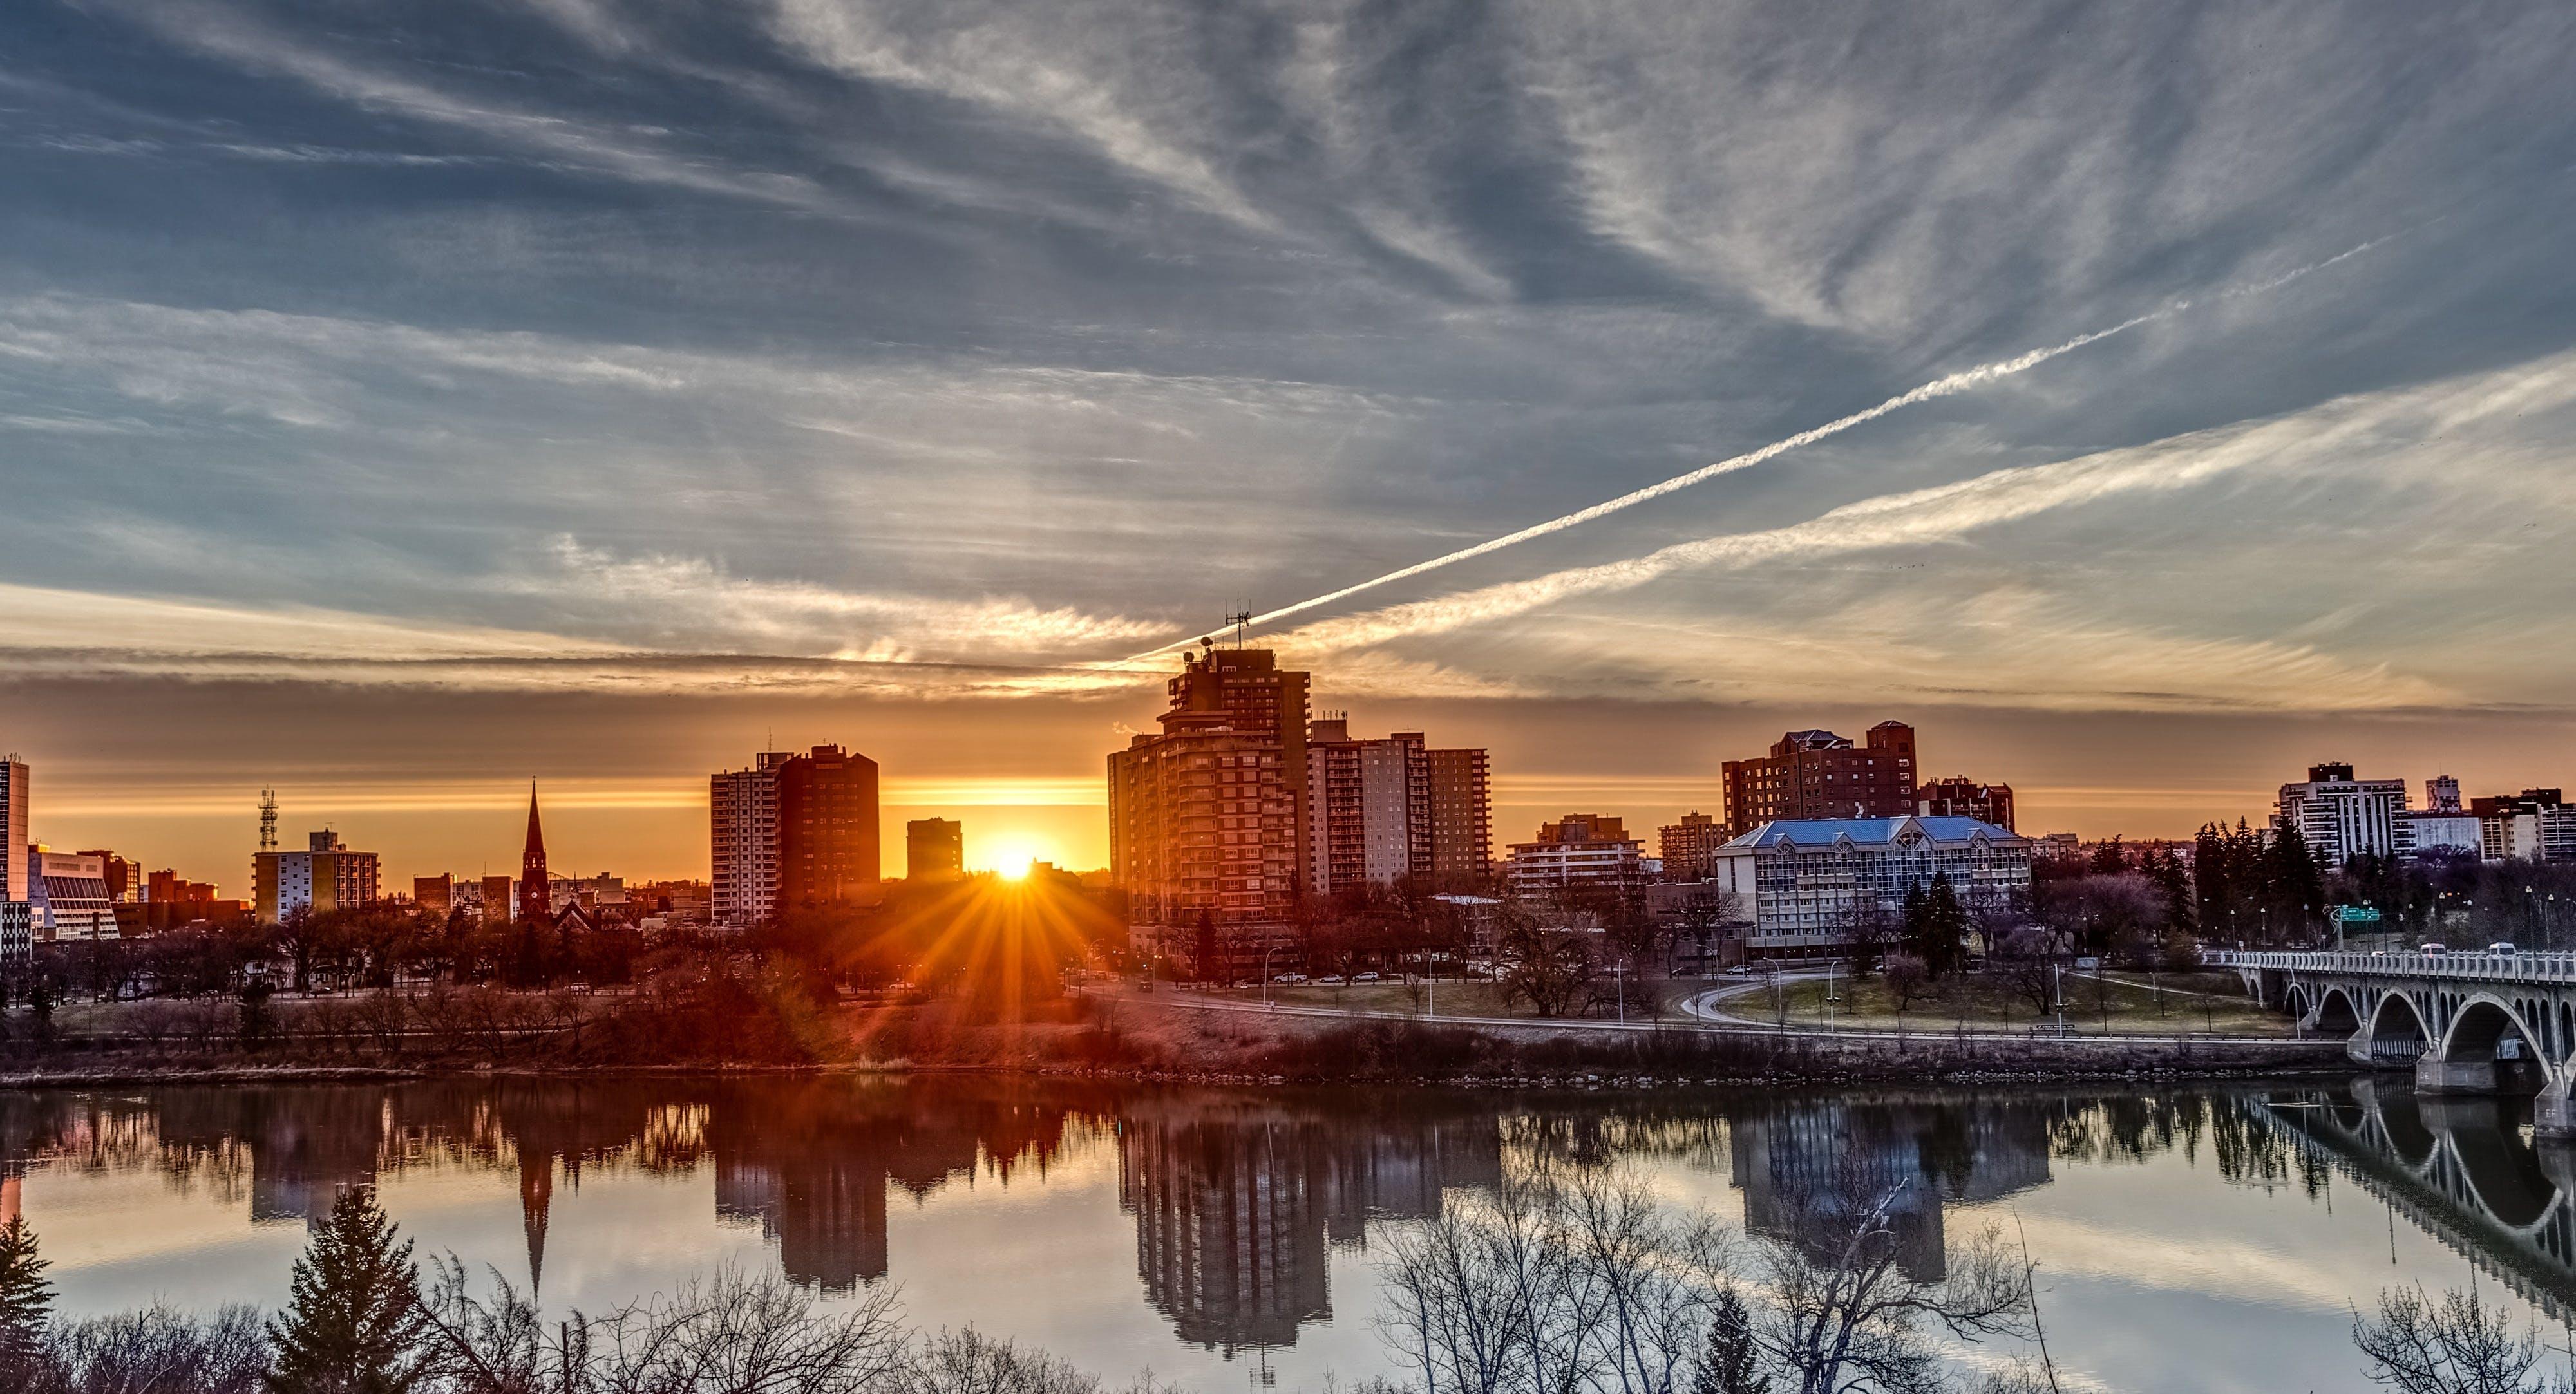 Skyline during Sunrise